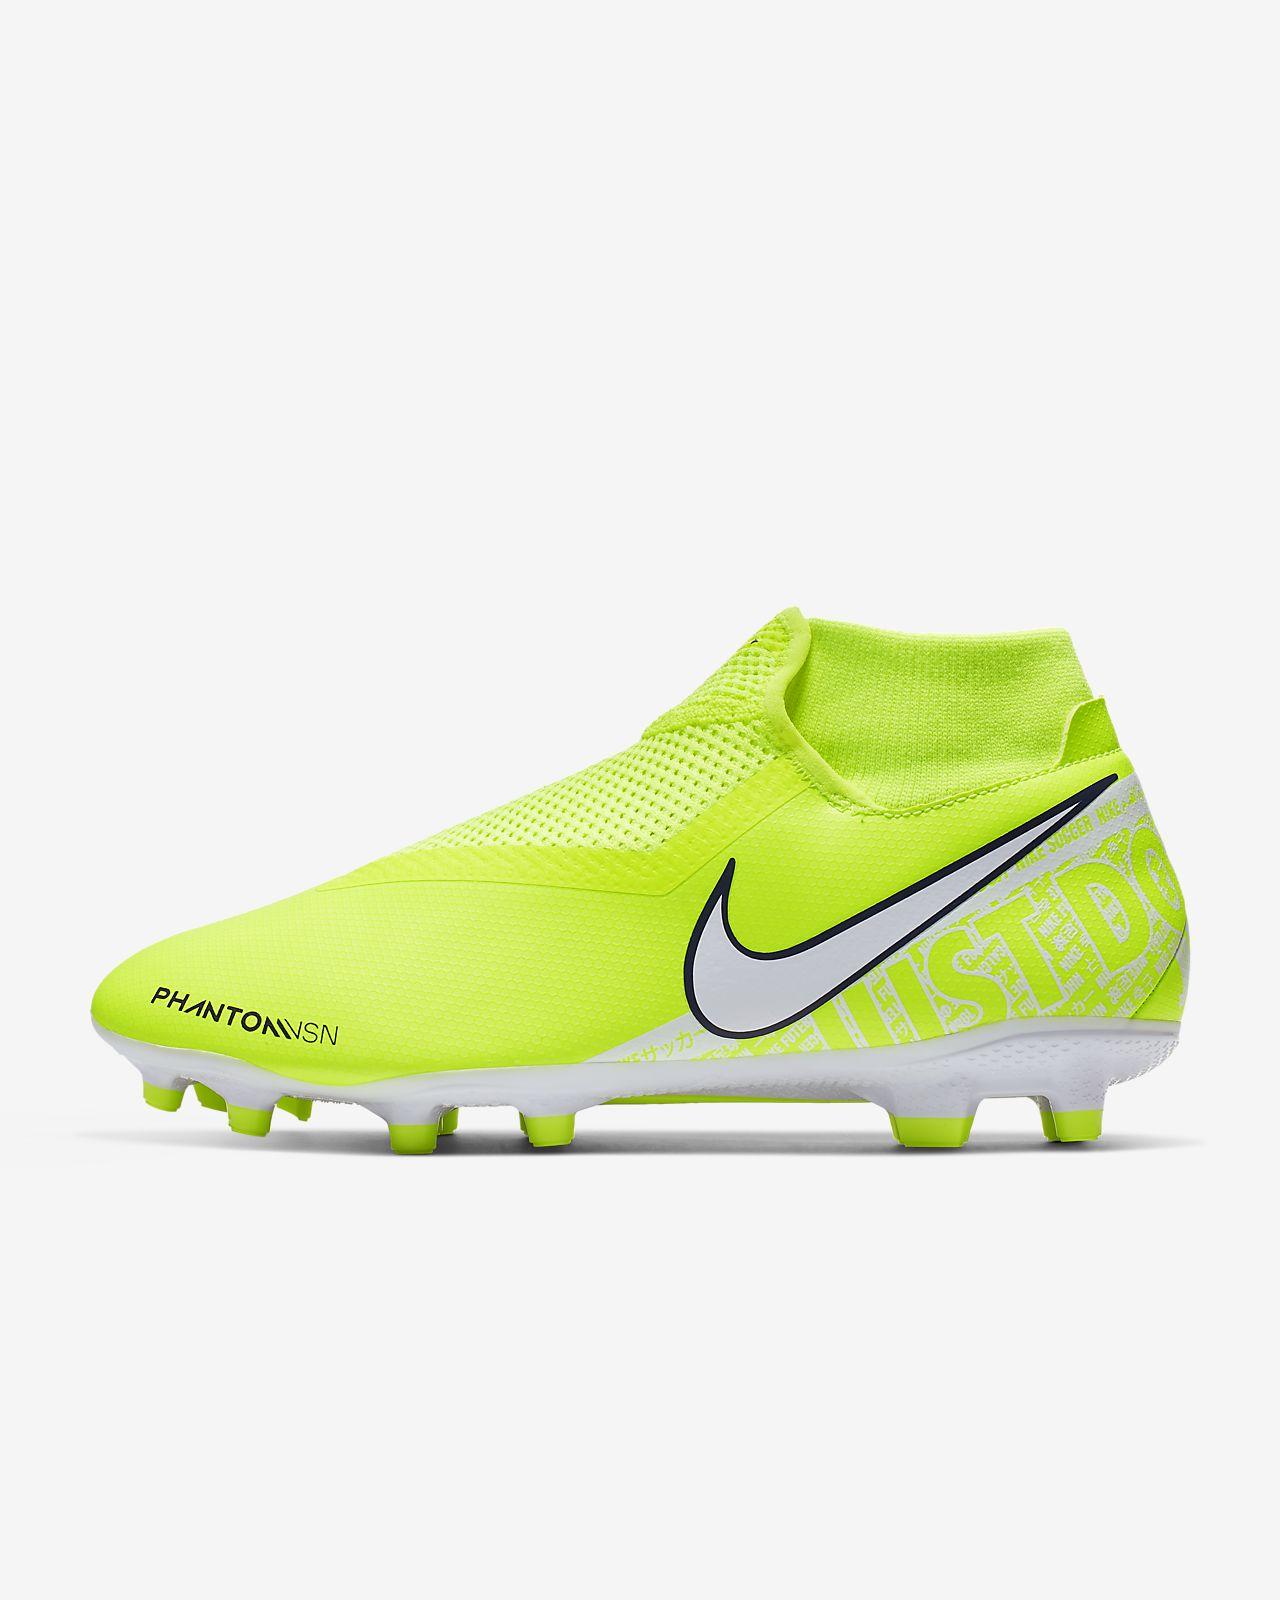 a0d67a65fa ... Nike Phantom Vision Academy Dynamic Fit MG Botas de fútbol para  múltiples superficies